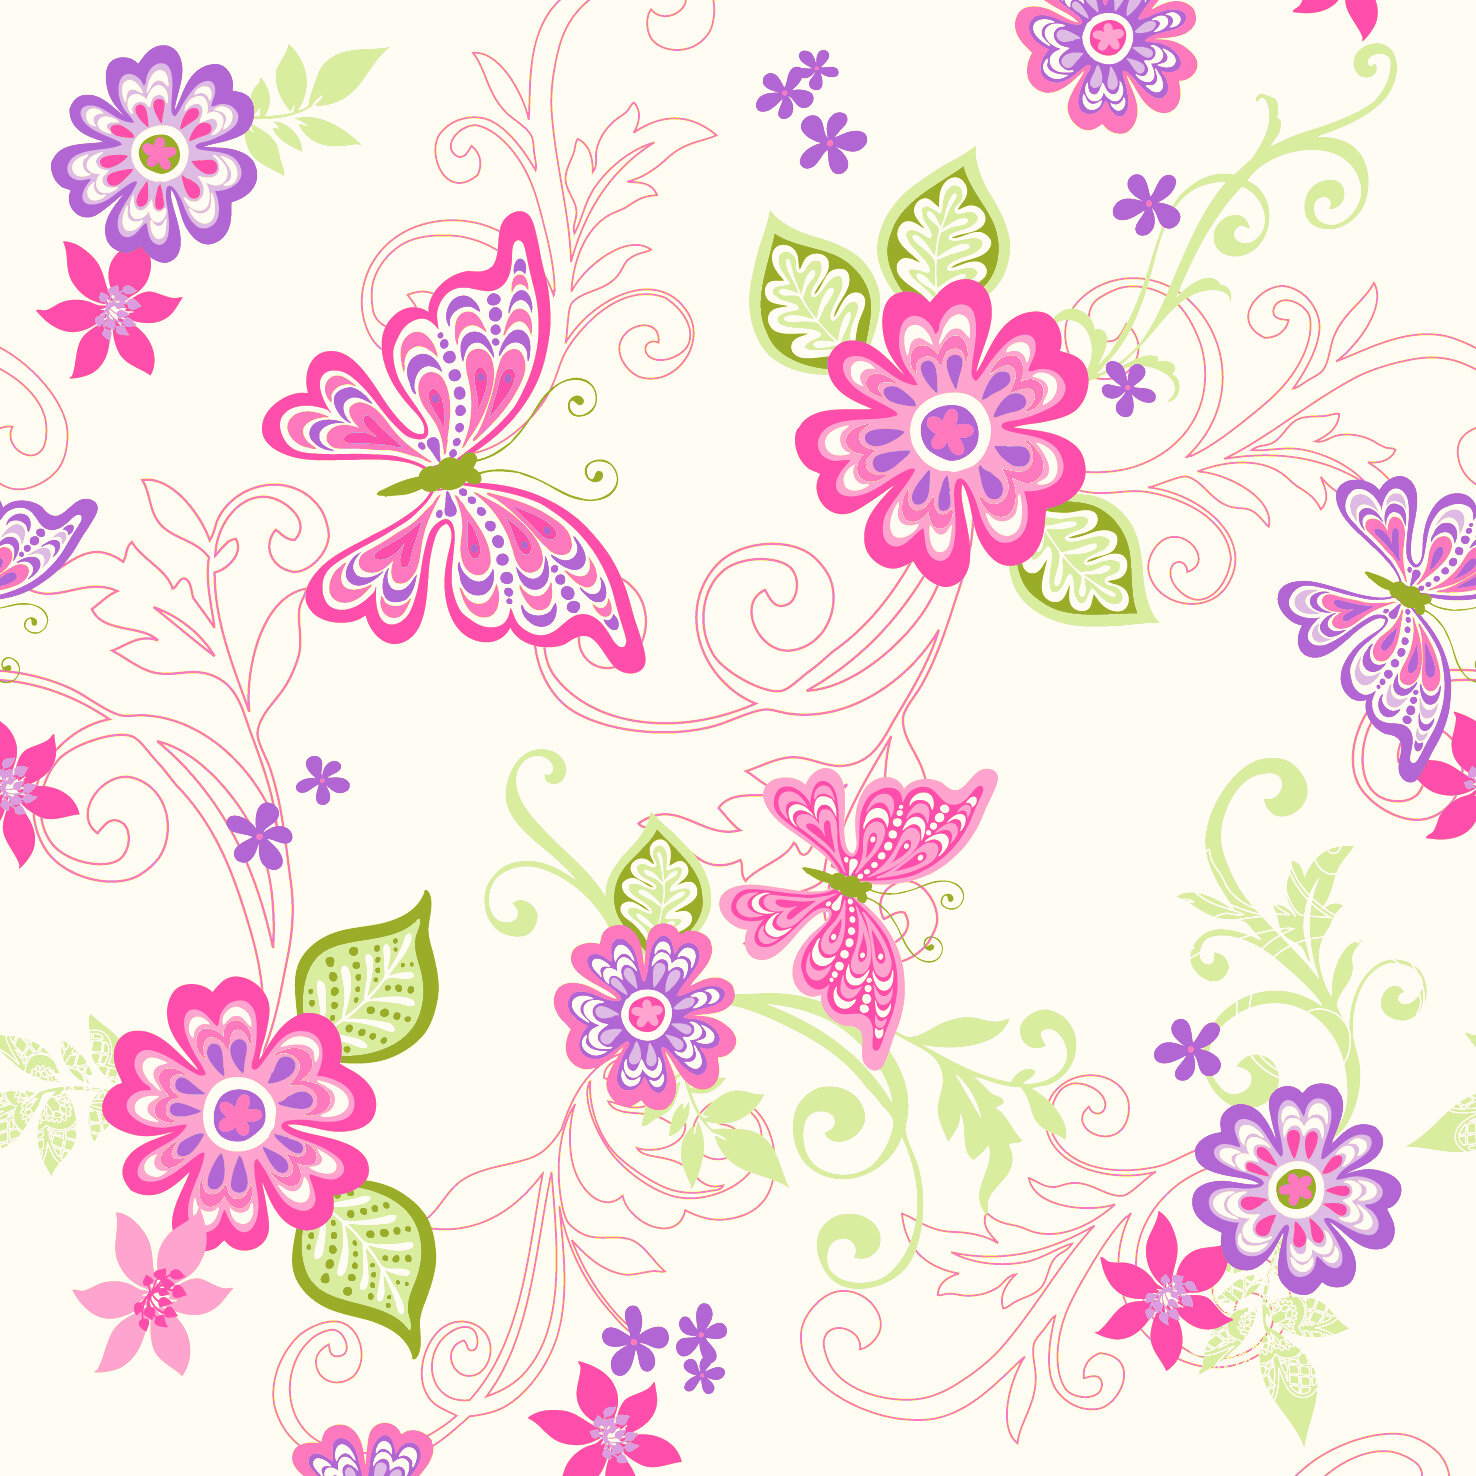 Zoomie Kids Melnick 16 5 X 20 5 Floral Border Wallpaper Wayfair